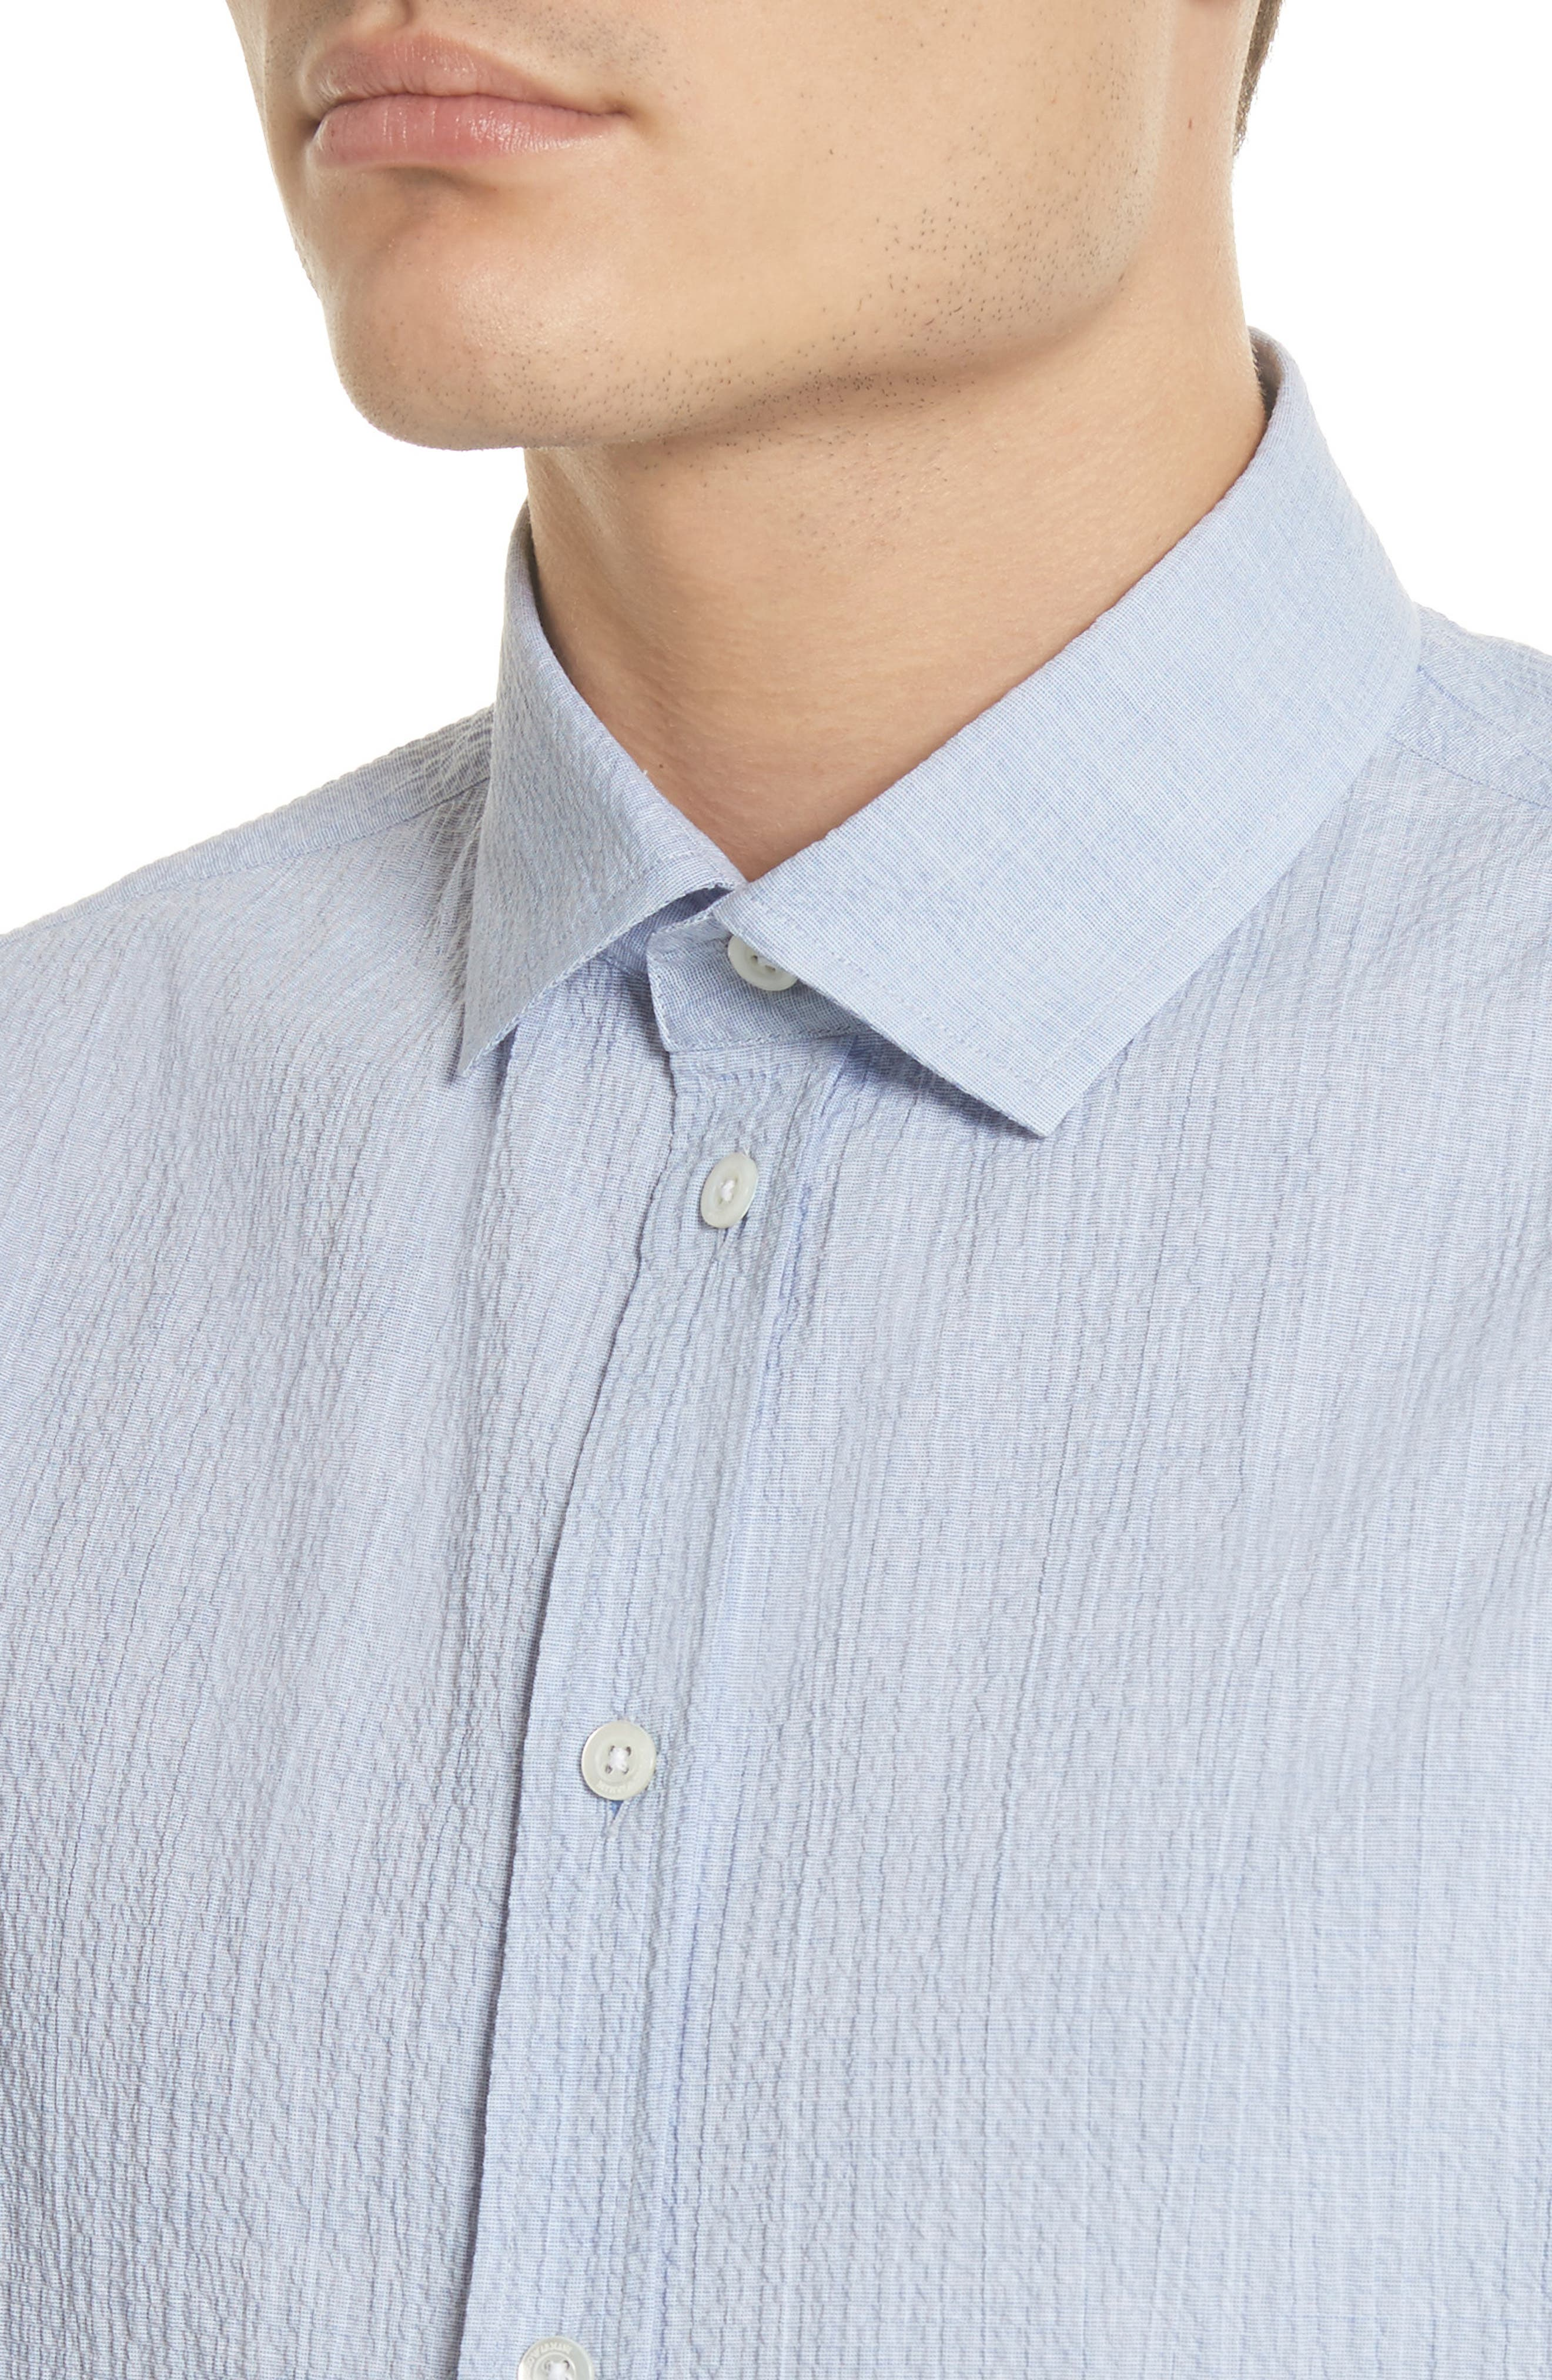 Regular Fit Seersucker Sport Shirt,                             Alternate thumbnail 4, color,